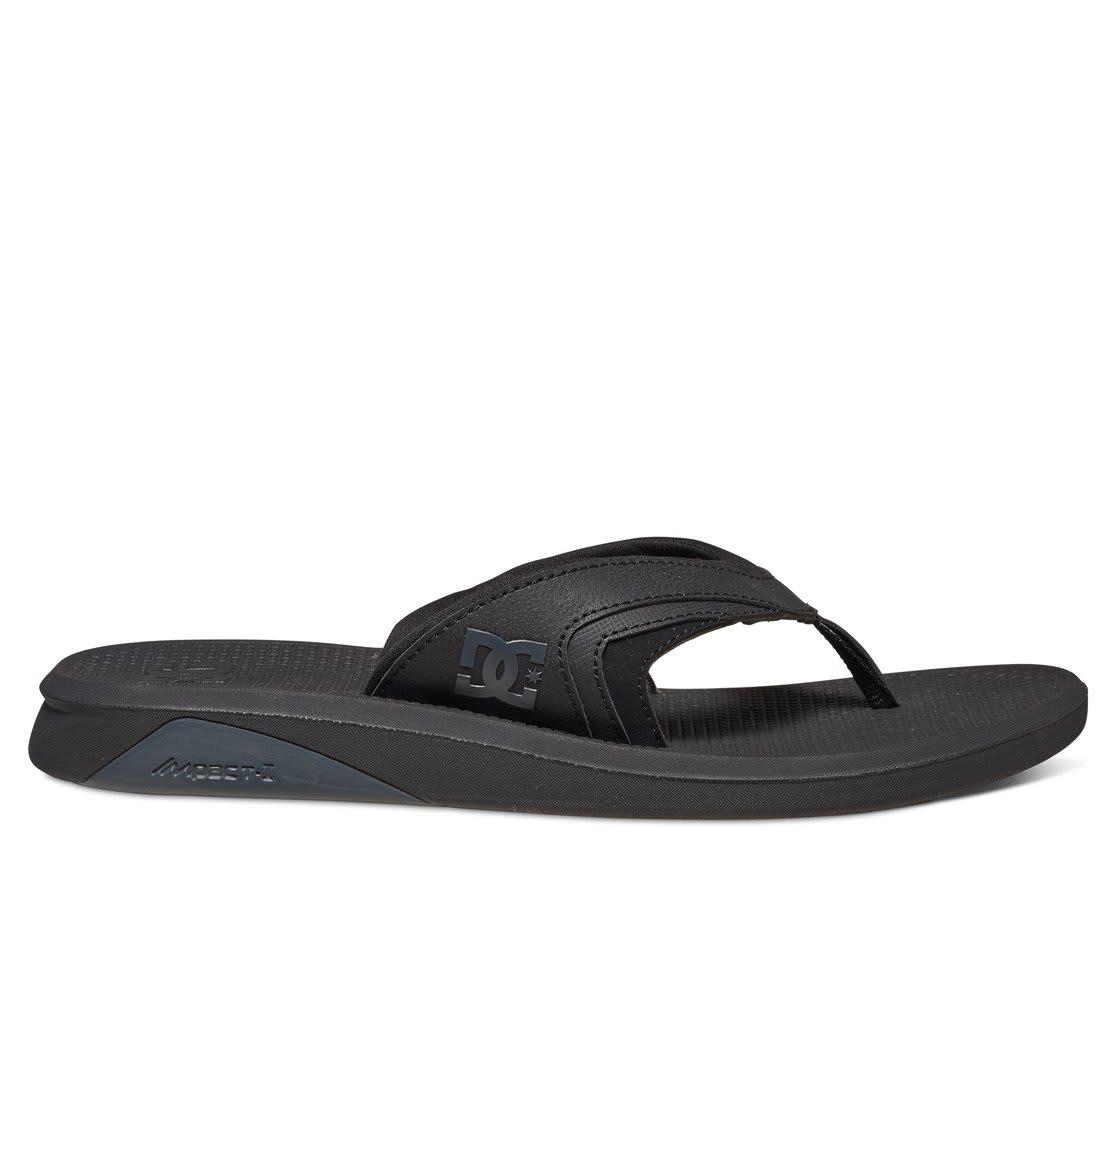 Shoes sandals flip flops - Dc Recoil By Bruce Irons Sandals